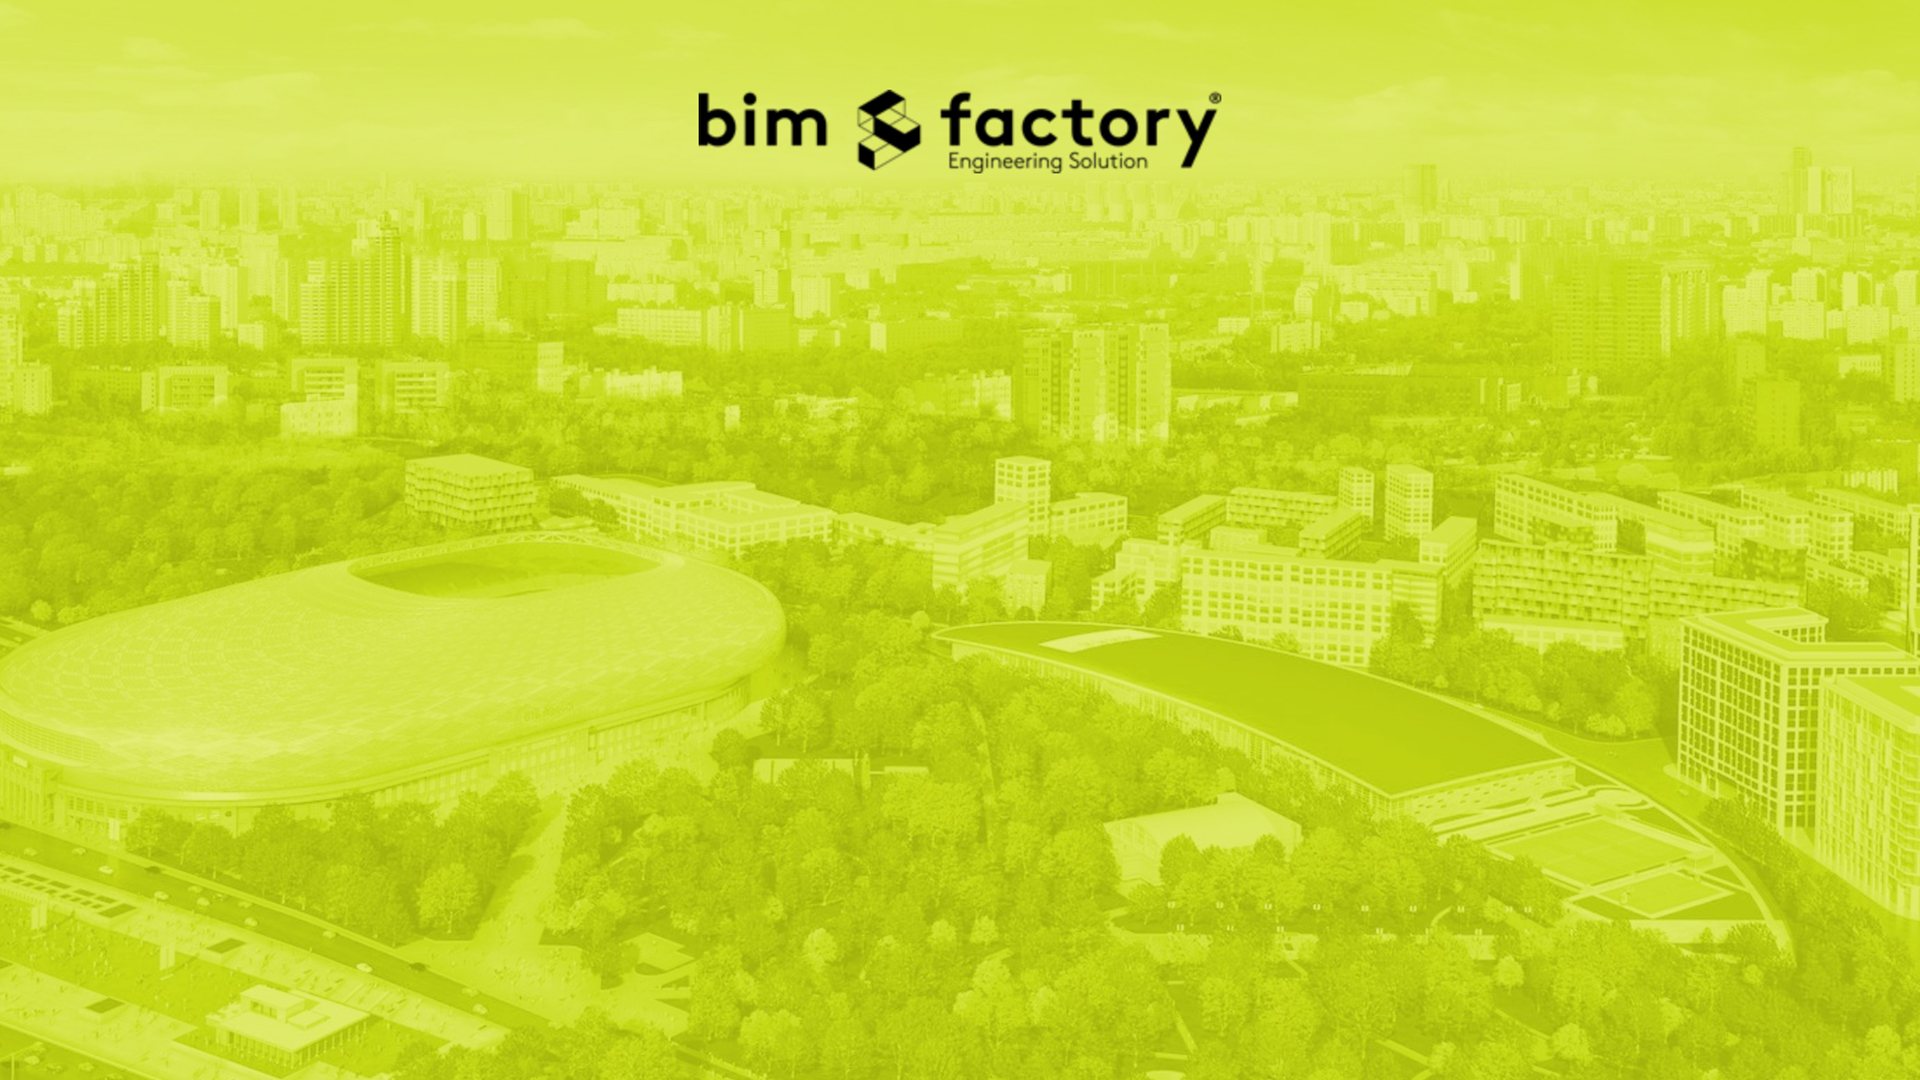 BimFactory